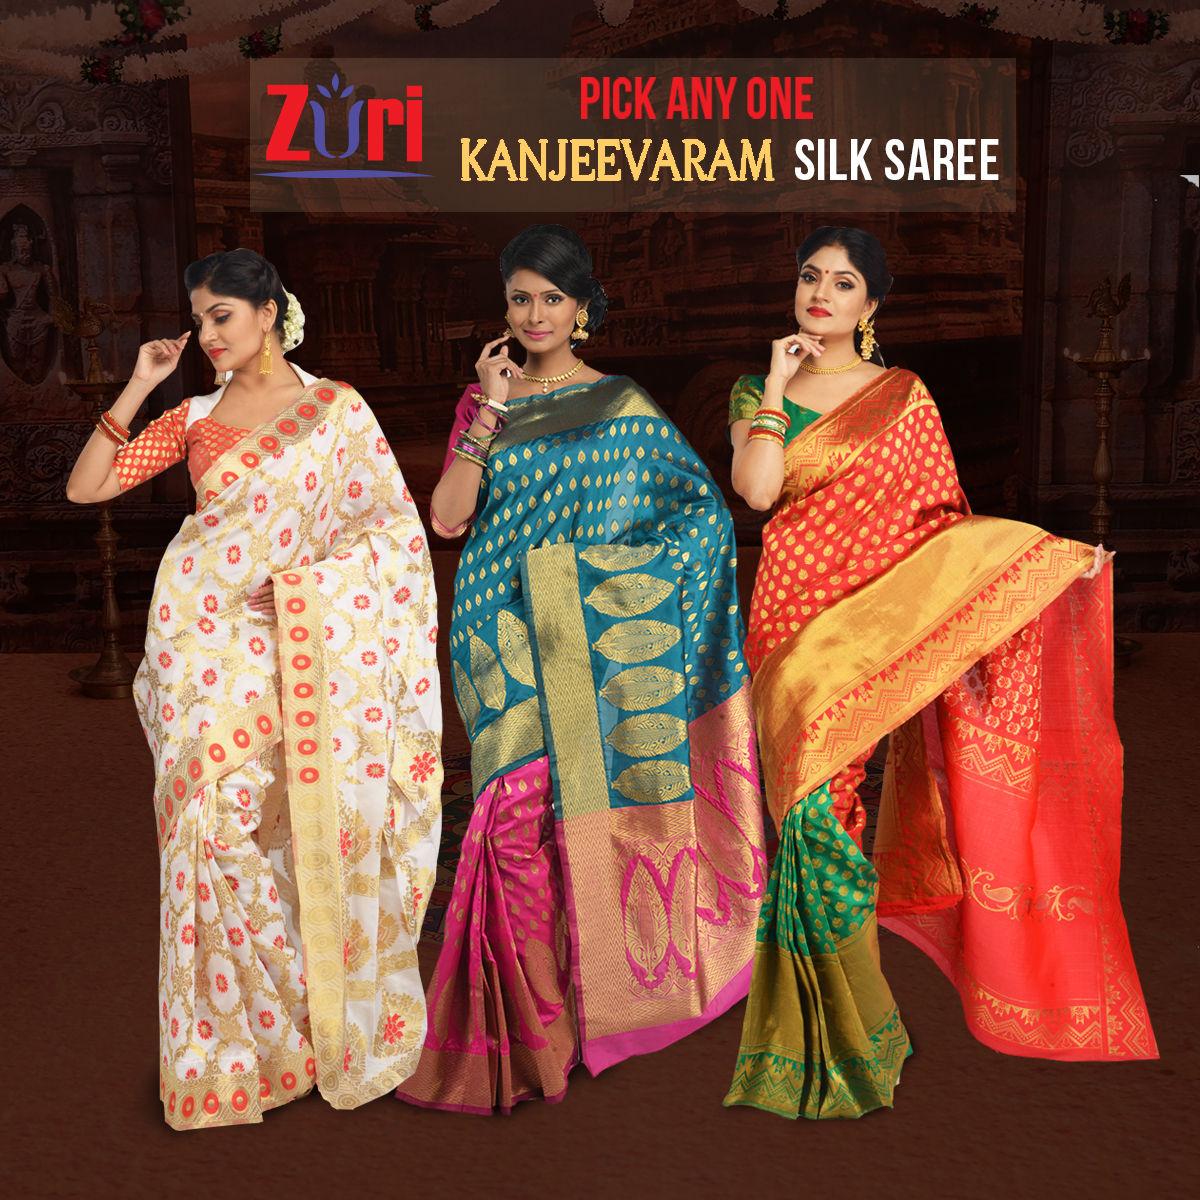 9a49e248c47 Buy Pick Any One Kanjeevaram Silk Saree by Zuri (KSS3) Online at Best Price  in India on Naaptol.com